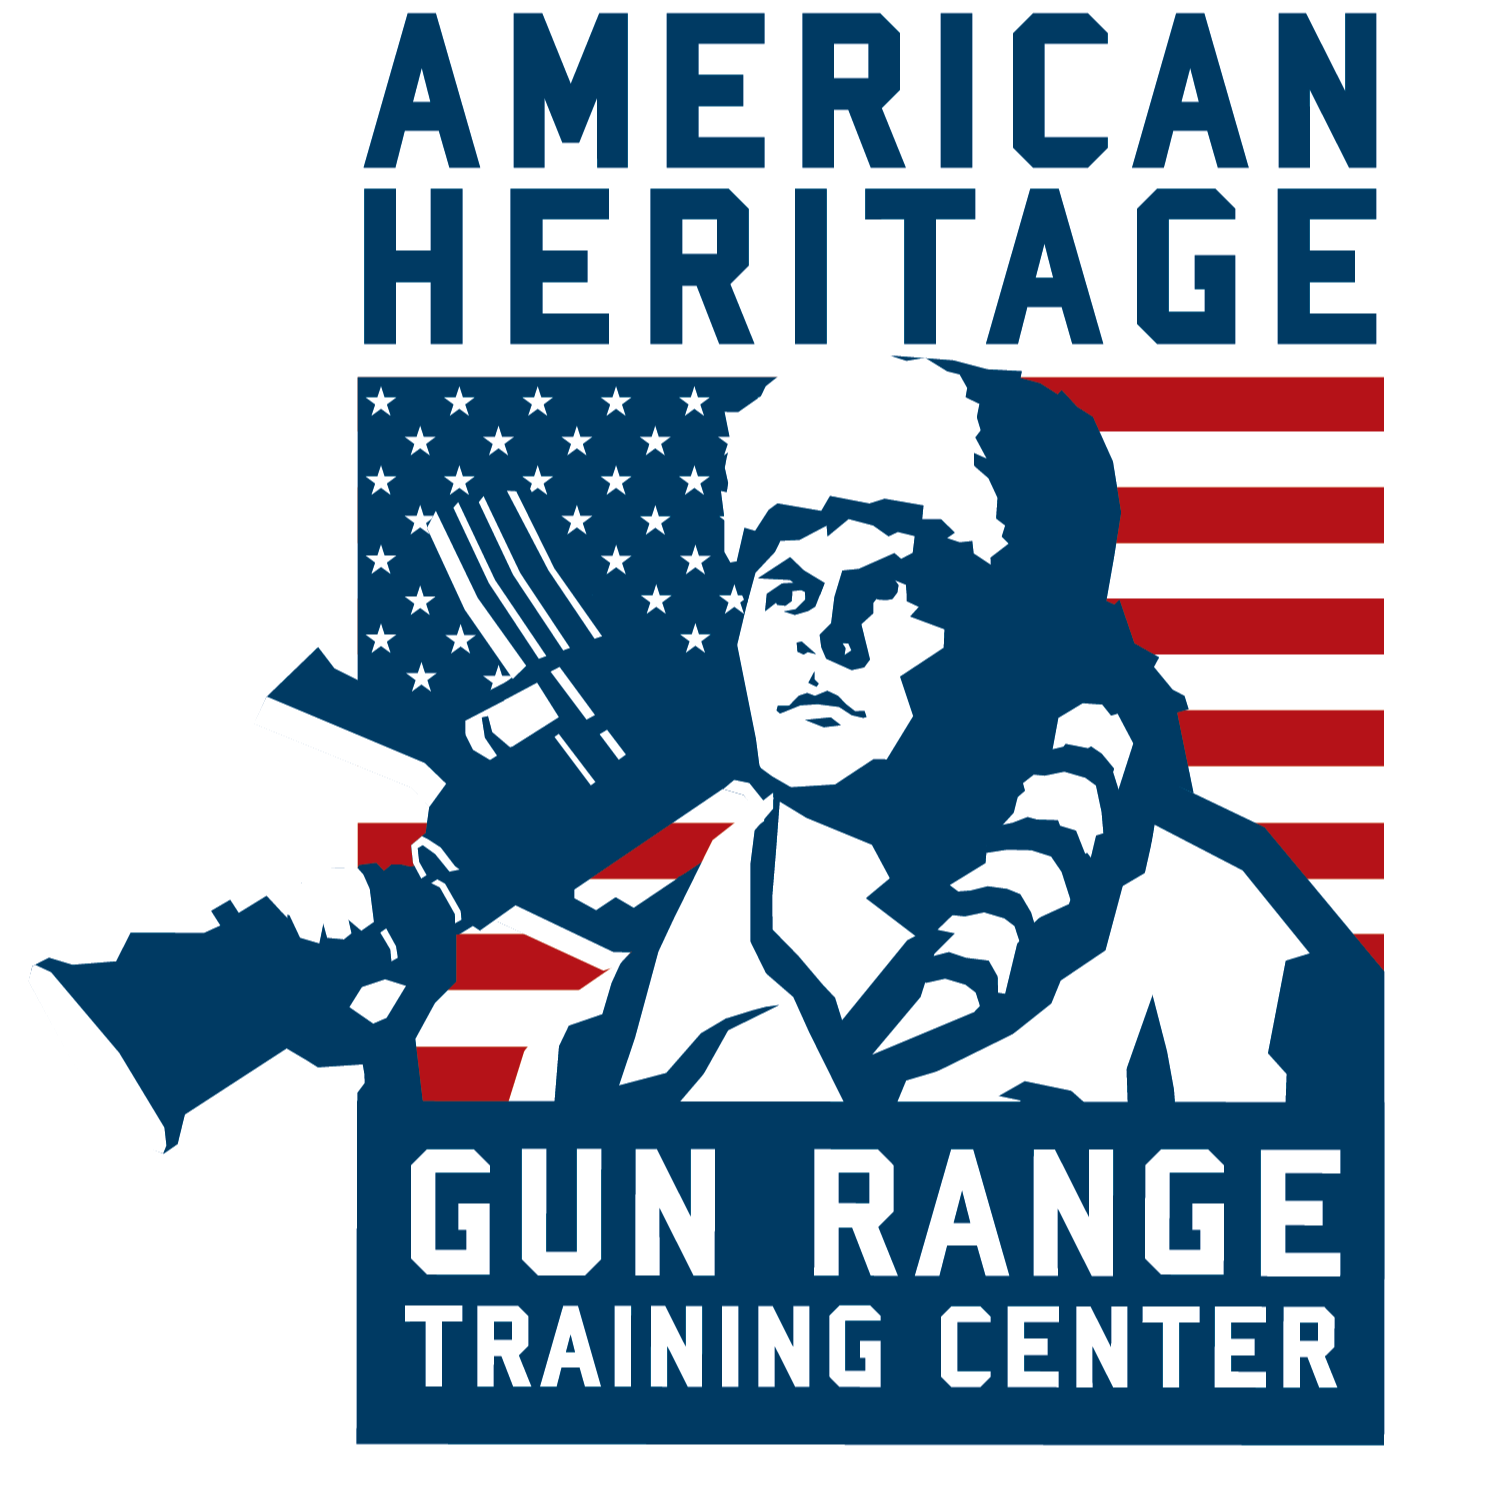 American Heritage Gun Range and Training Center